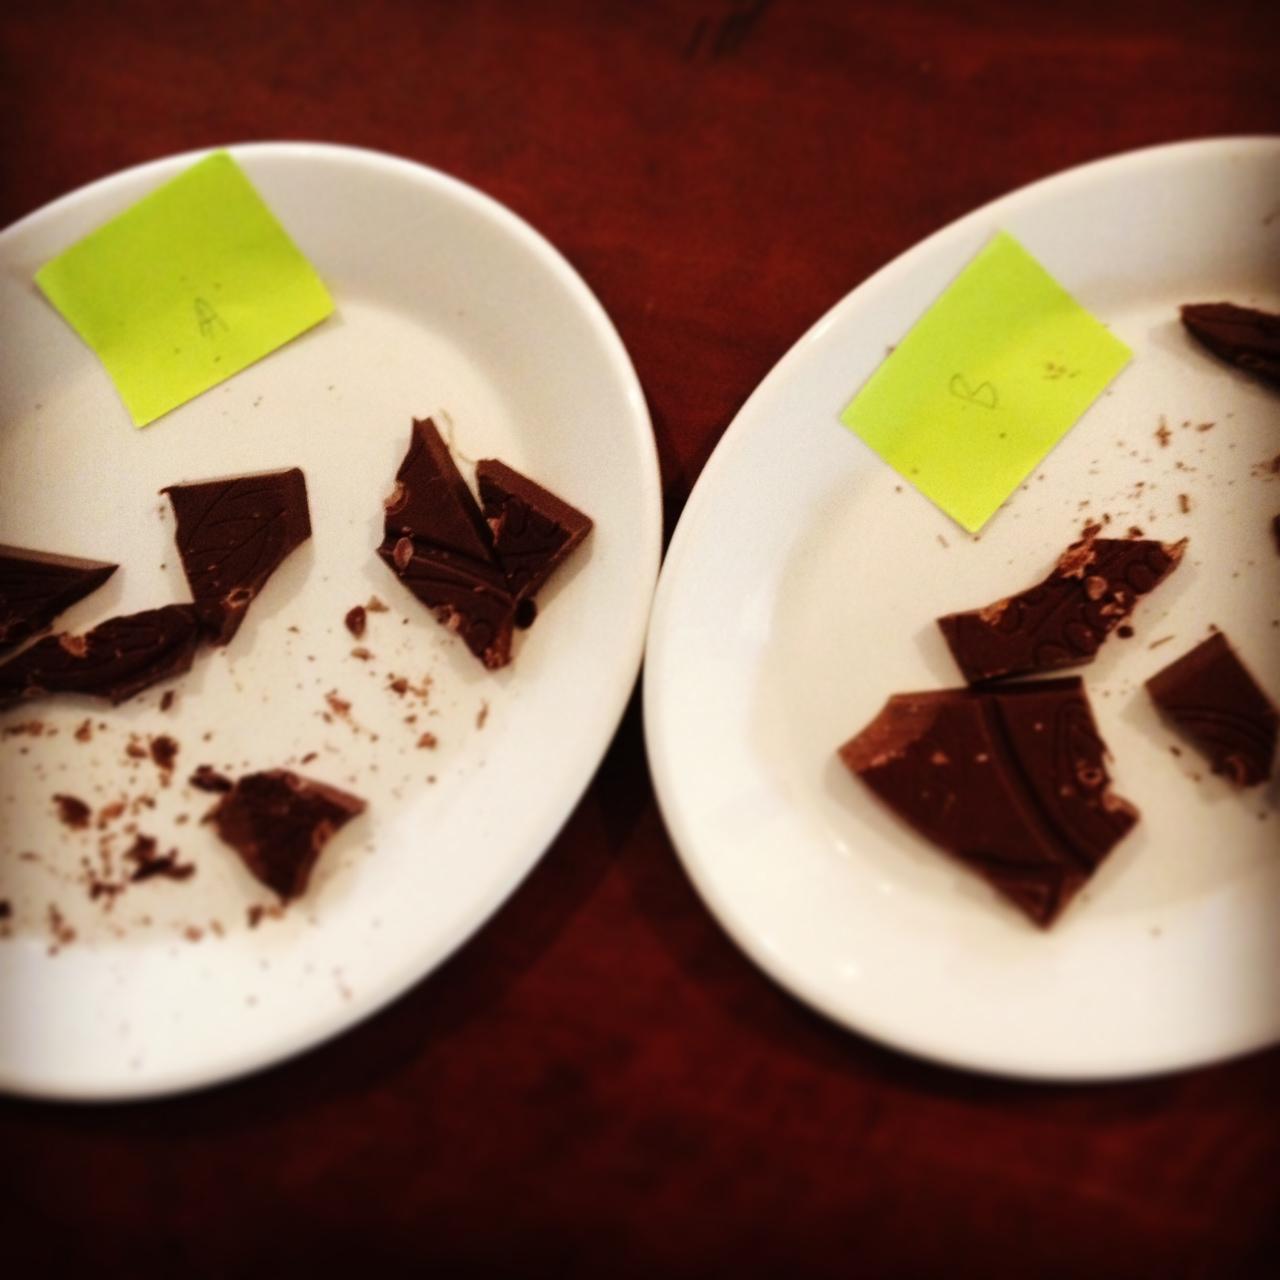 Fancy a taste of Chocolate 'B'?